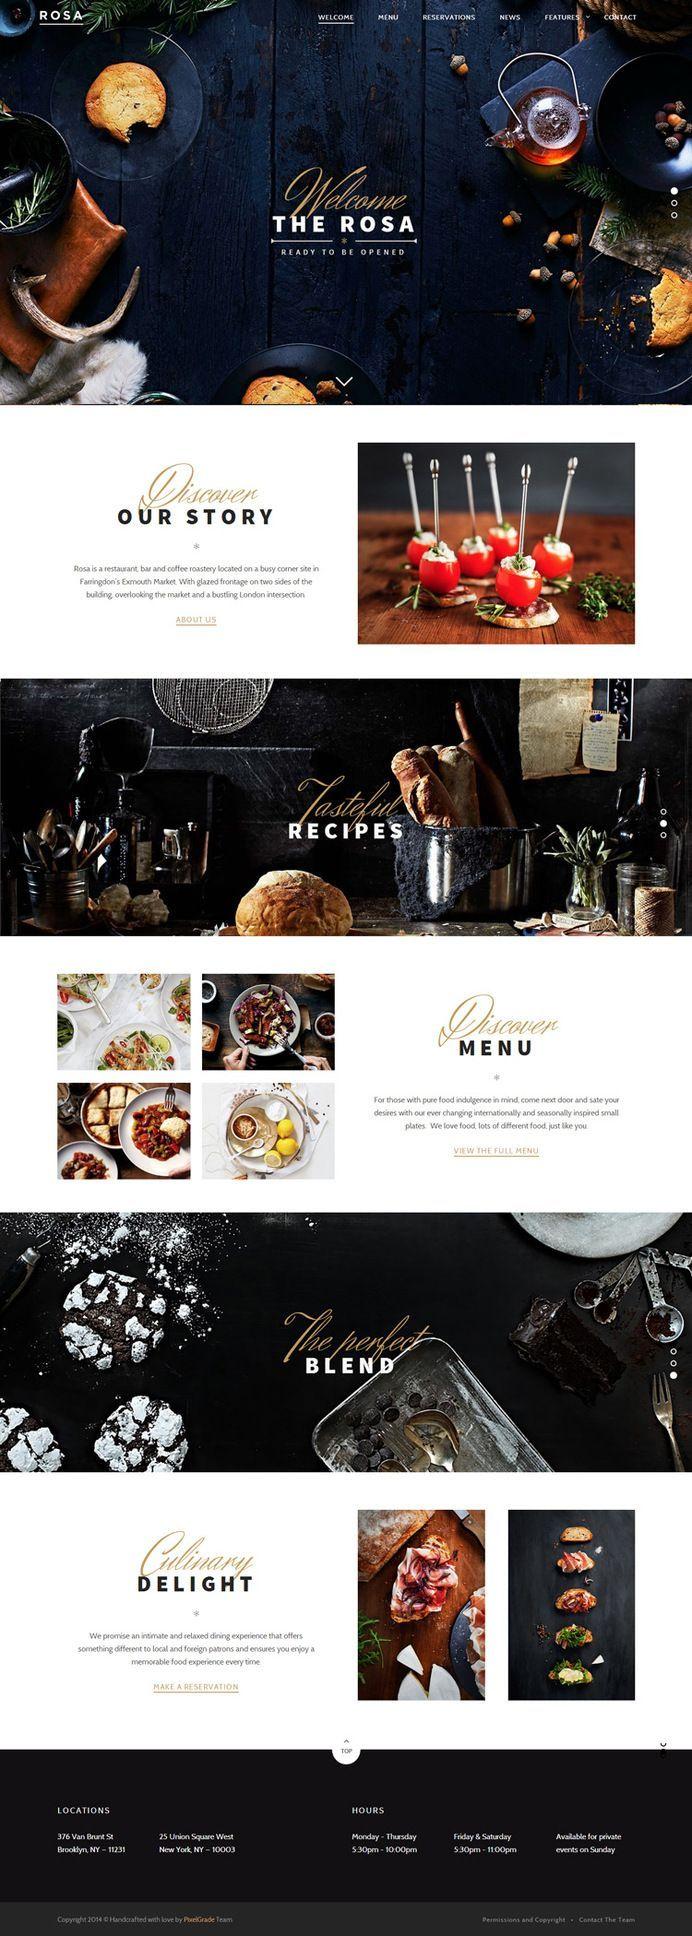 Best ideas about restaurant layout on pinterest